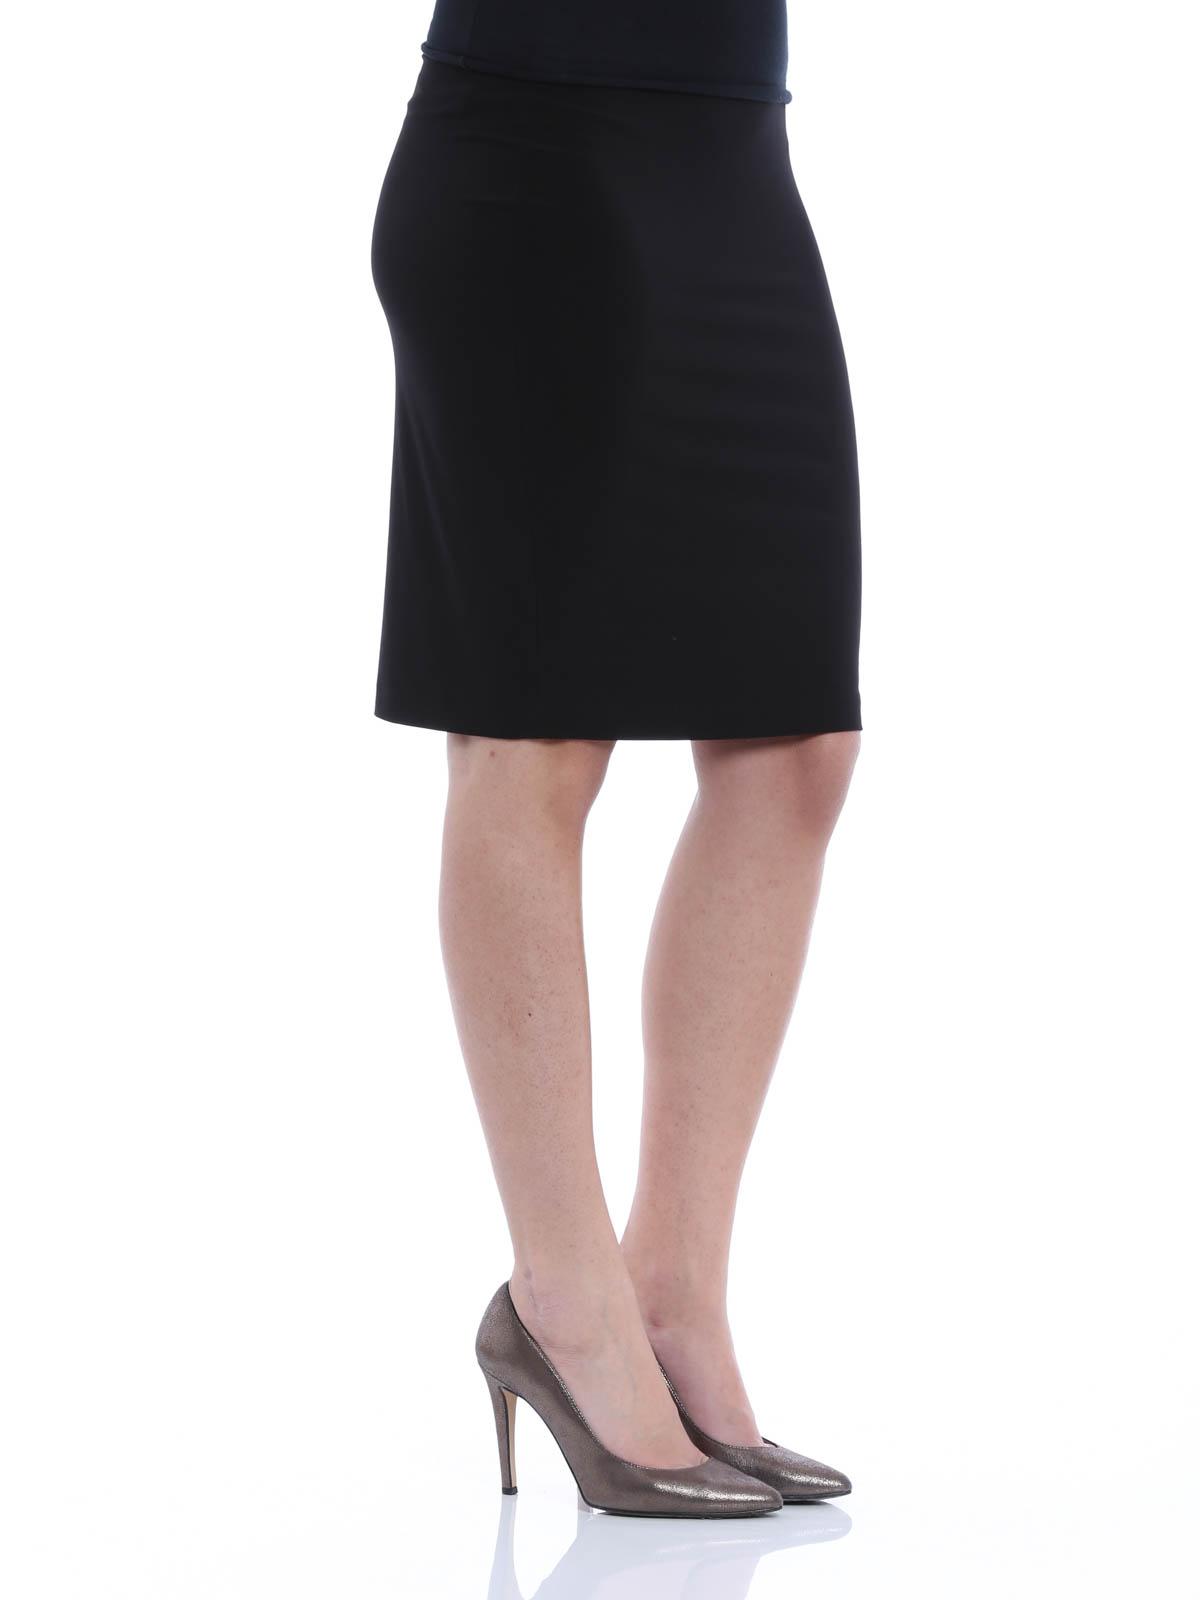 SKIRTS - Knee length skirts Norma Kamali Clearance Brand New Unisex nw7R5E